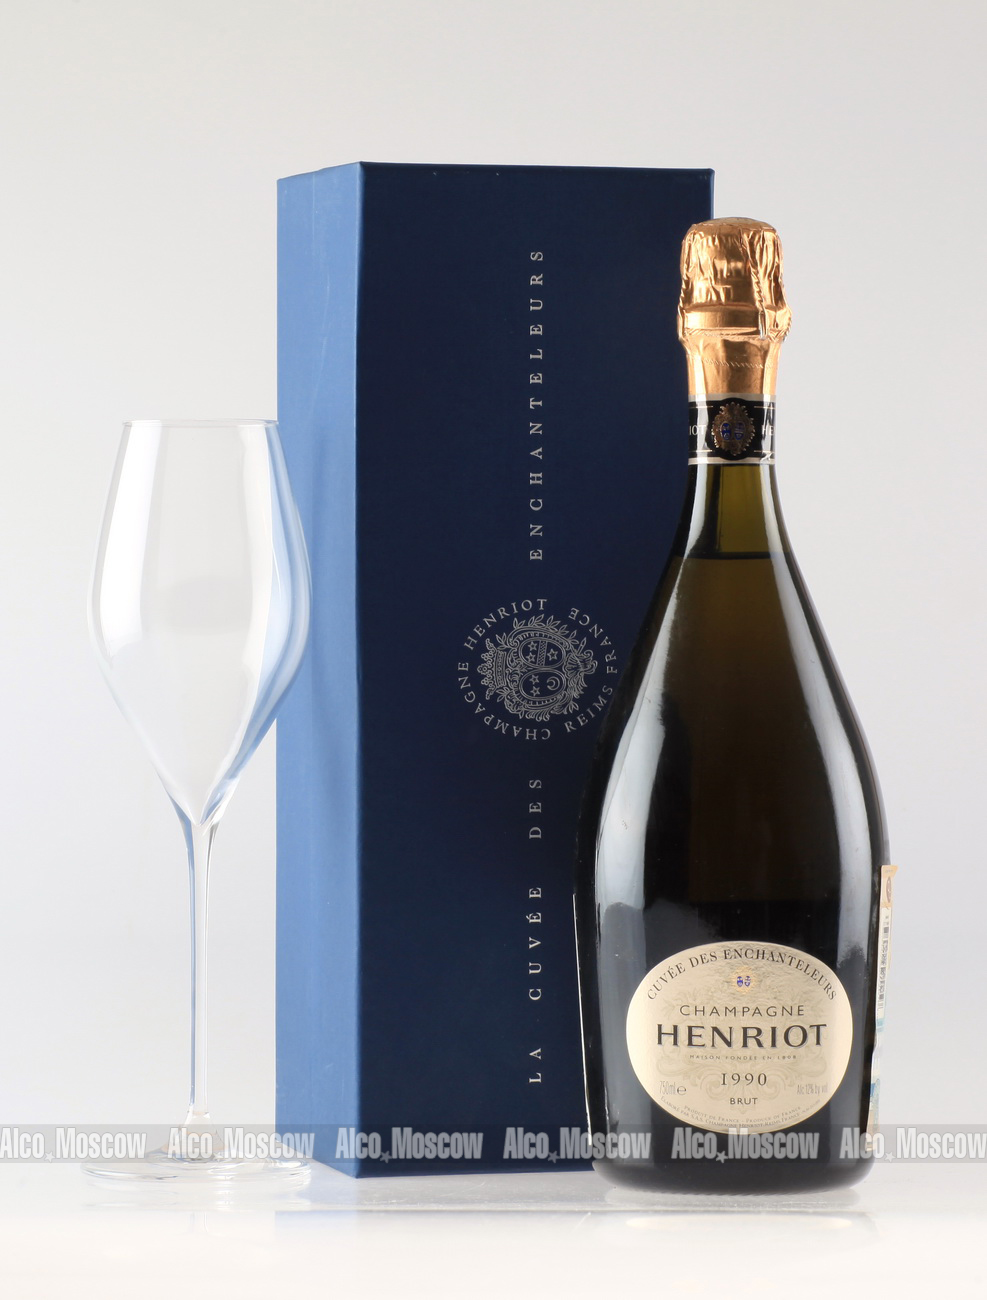 Henriot Henriot 1990 шампанское Энрио 1990 года